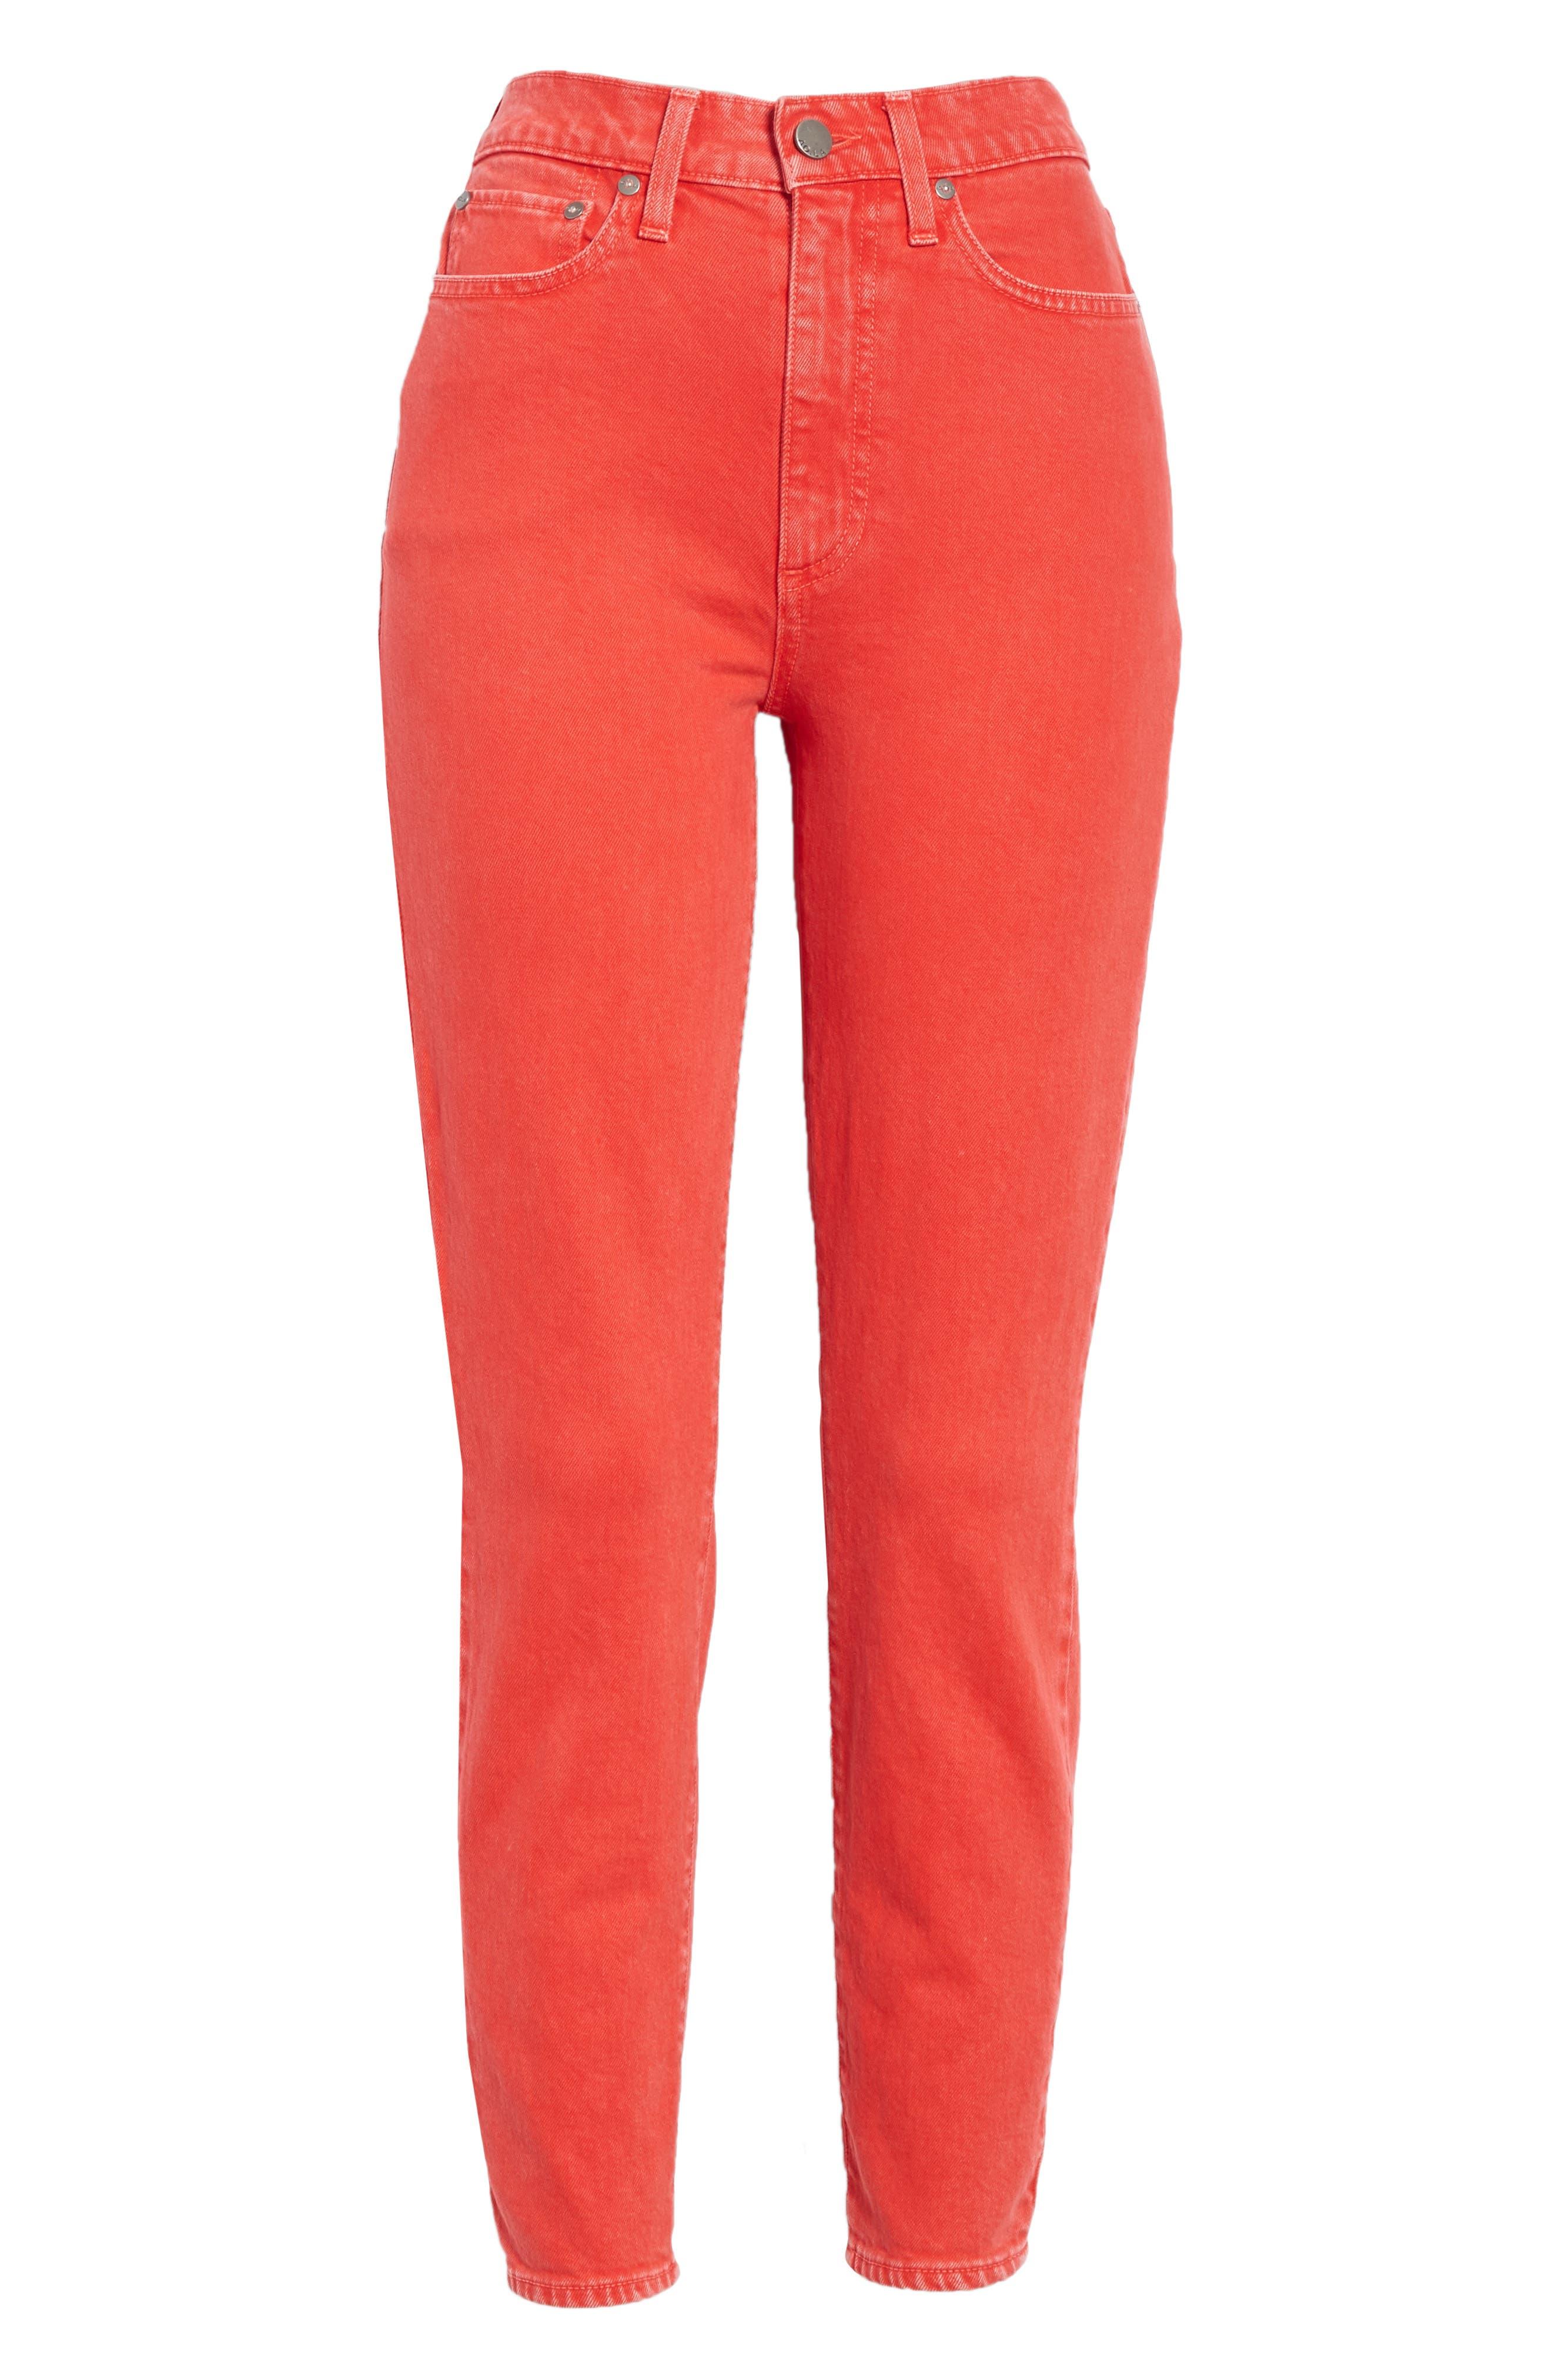 AO.LA Good High Rise Ankle Skinny Jeans,                             Alternate thumbnail 6, color,